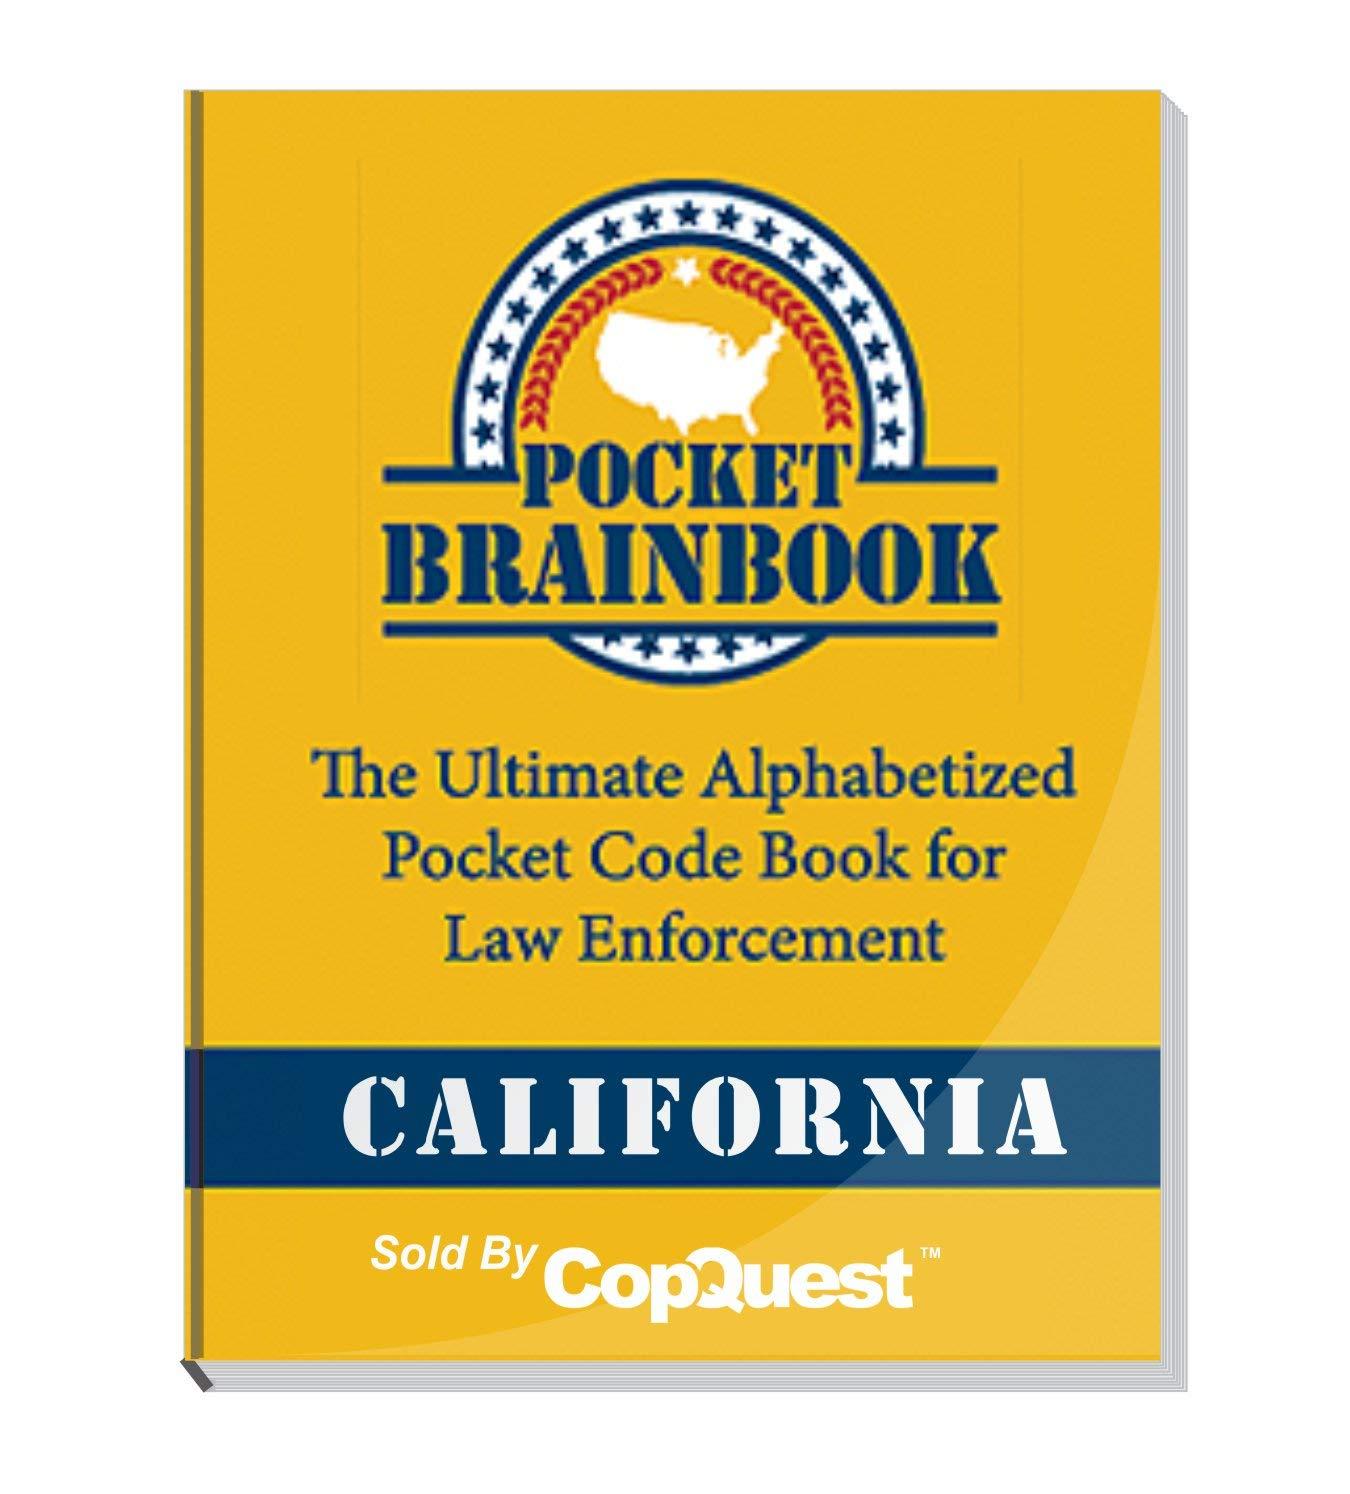 Pocket Brainbook - California Police Edition - 2019 by POCKET BRAINBOOK